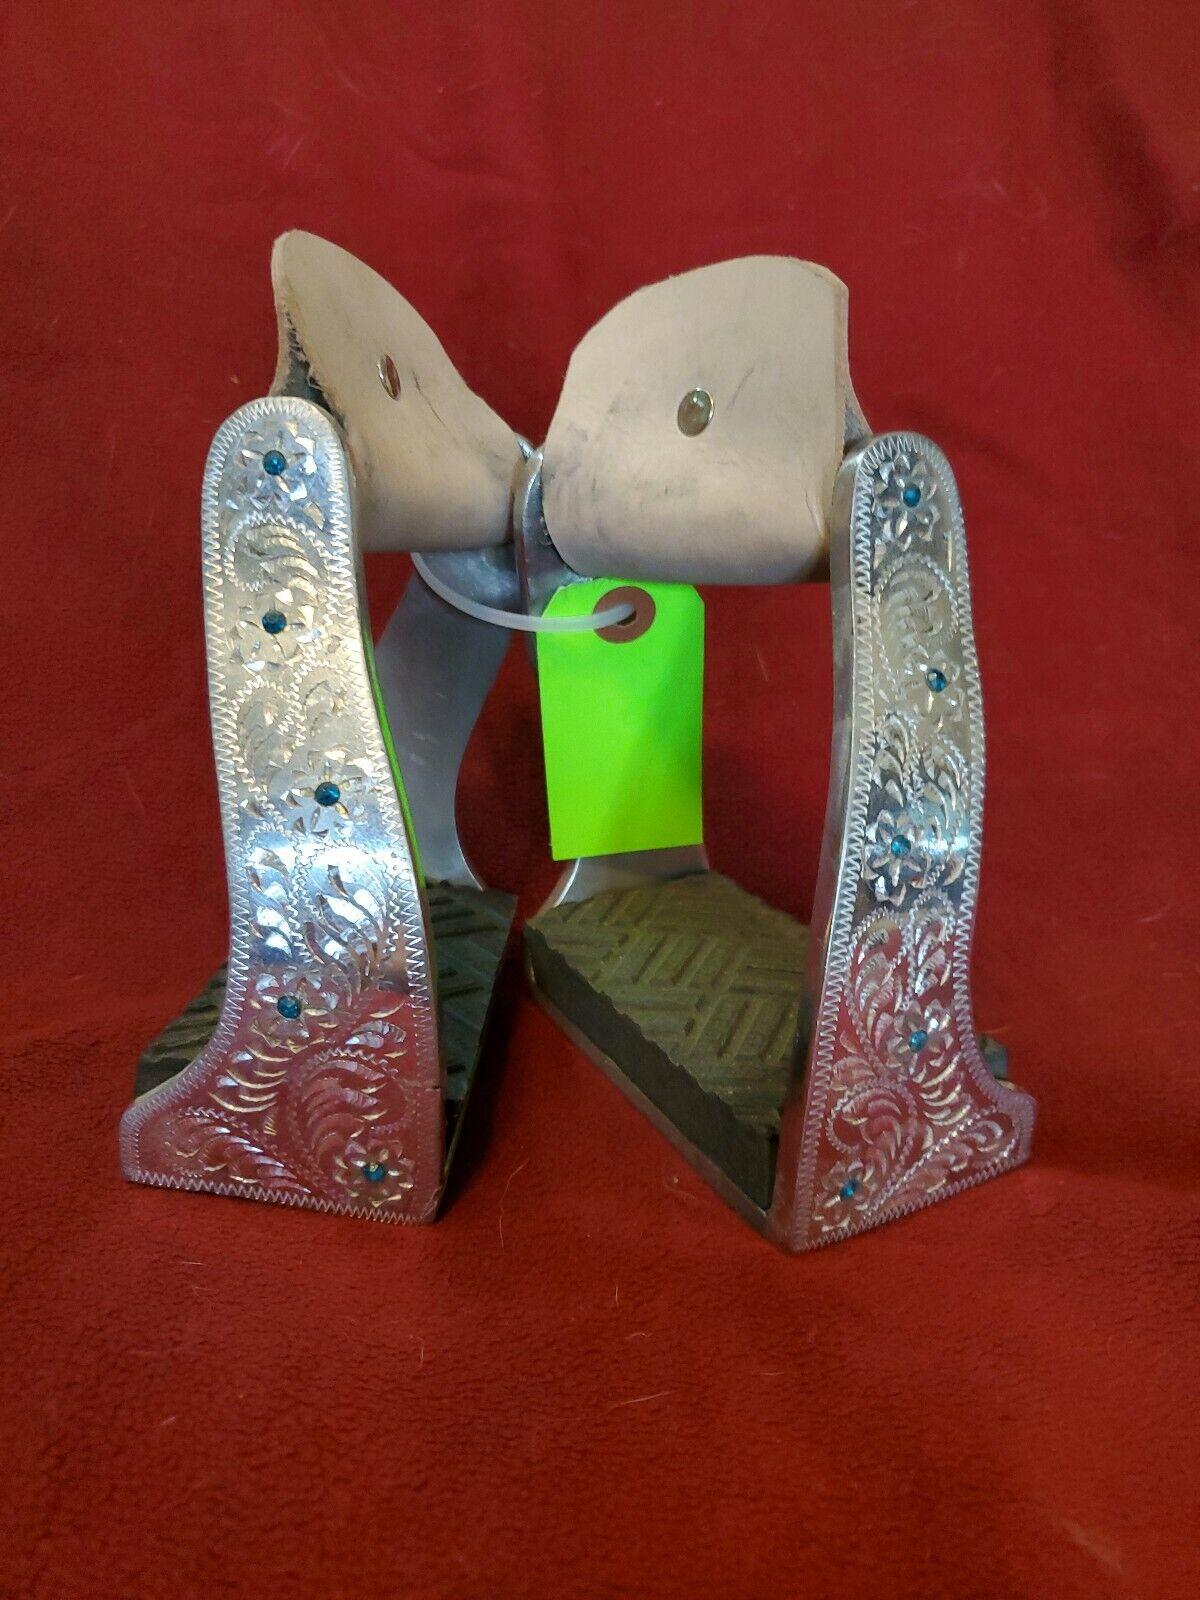 Engraved Aluminum STIRRUPS with blu Crystals   GORGEOUS 4 mostrare barrels enduranc